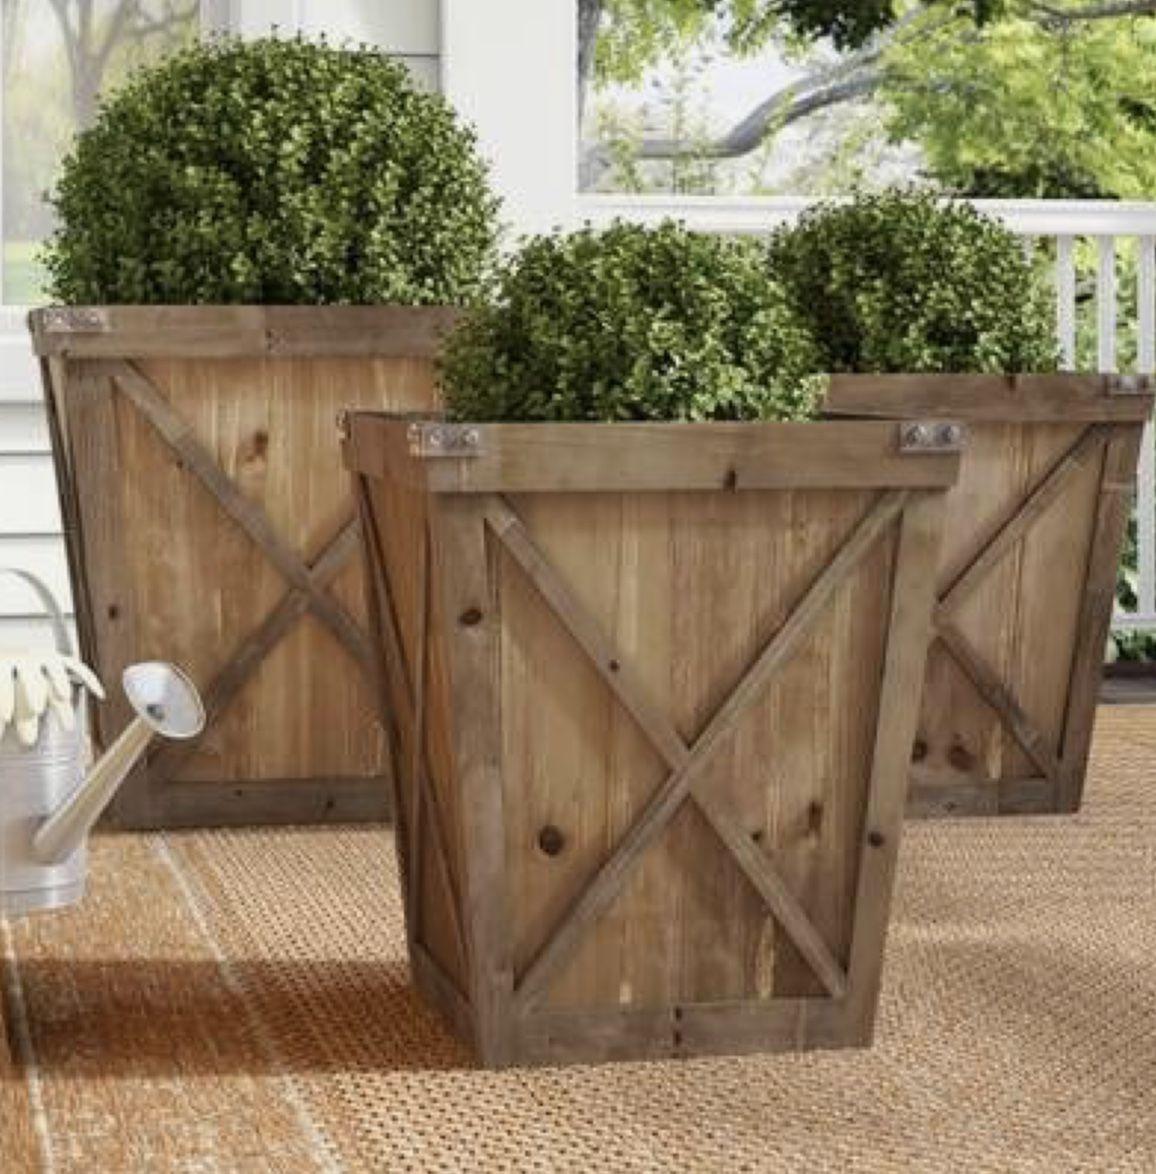 Key Design Elements Of A Farmhouse Exterior Wood Planters Wood Planter Box Planter Boxes